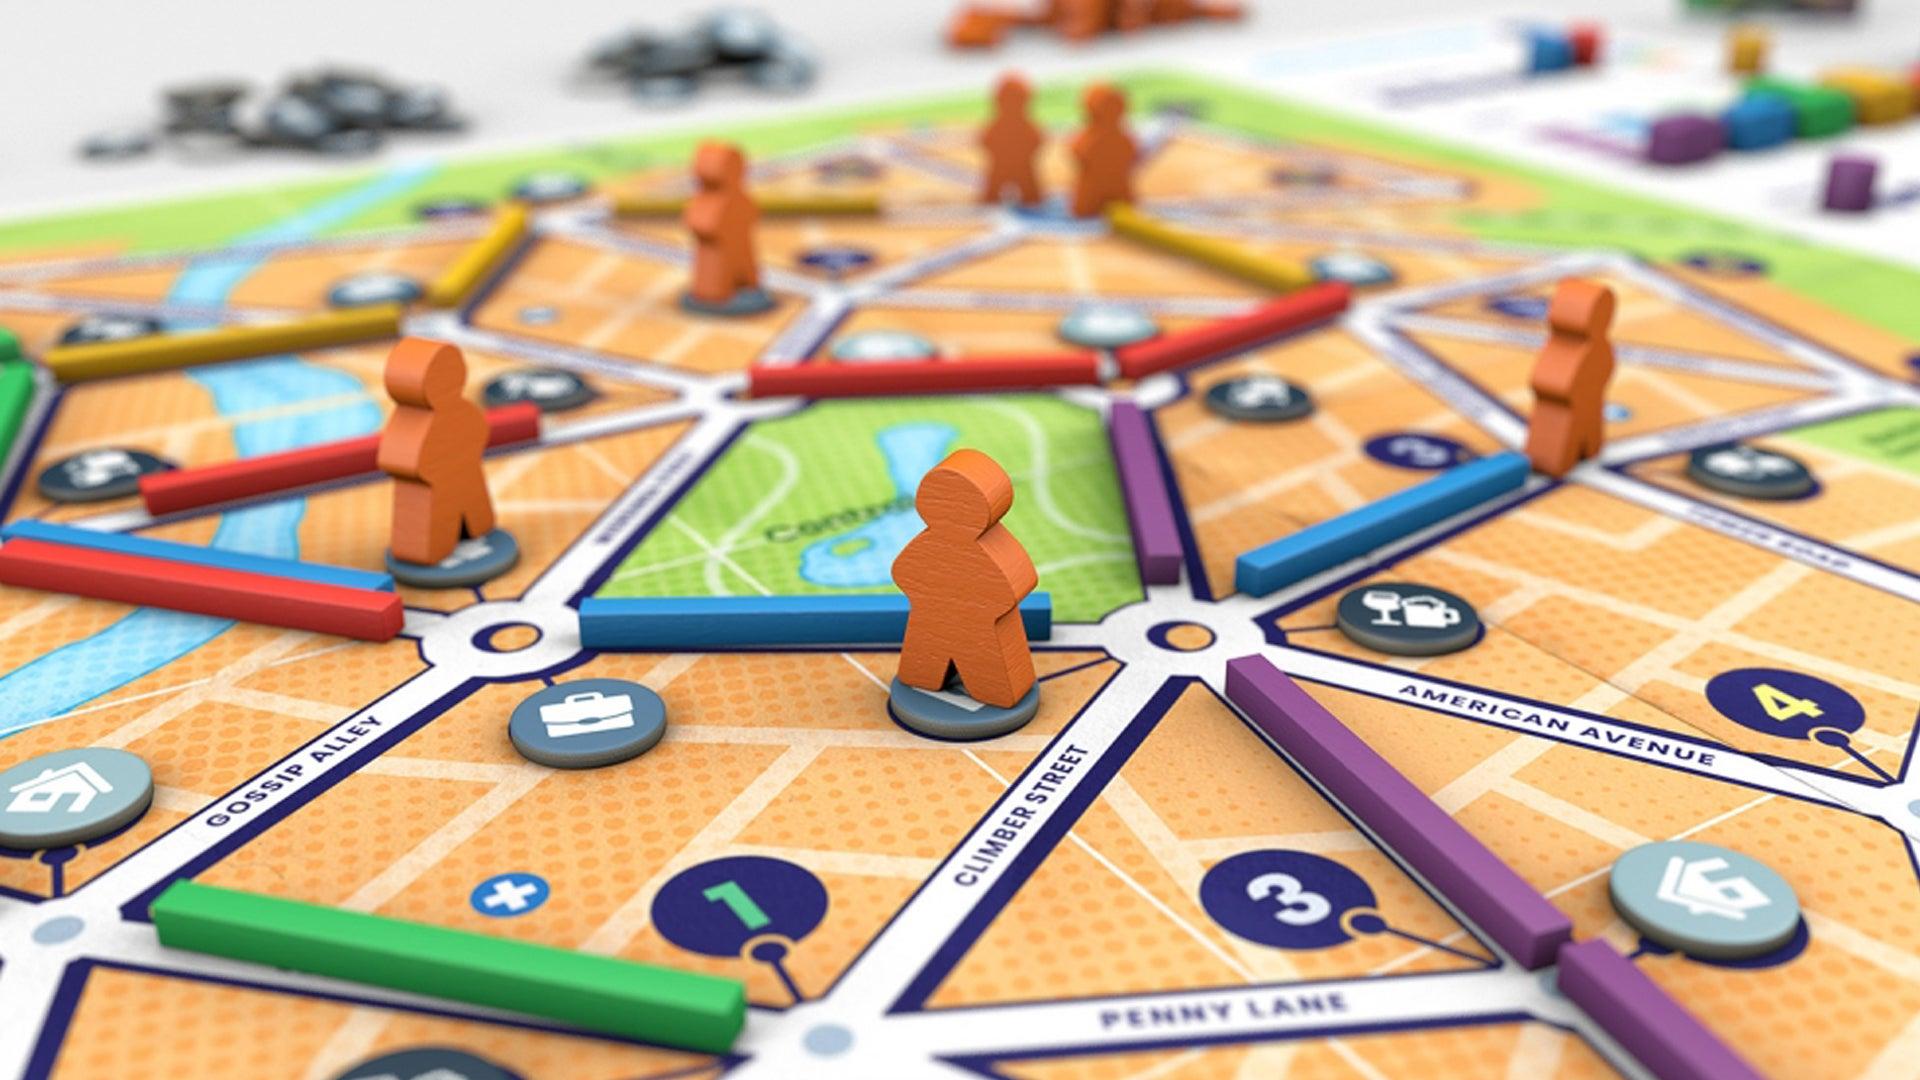 Bus board game gameplay